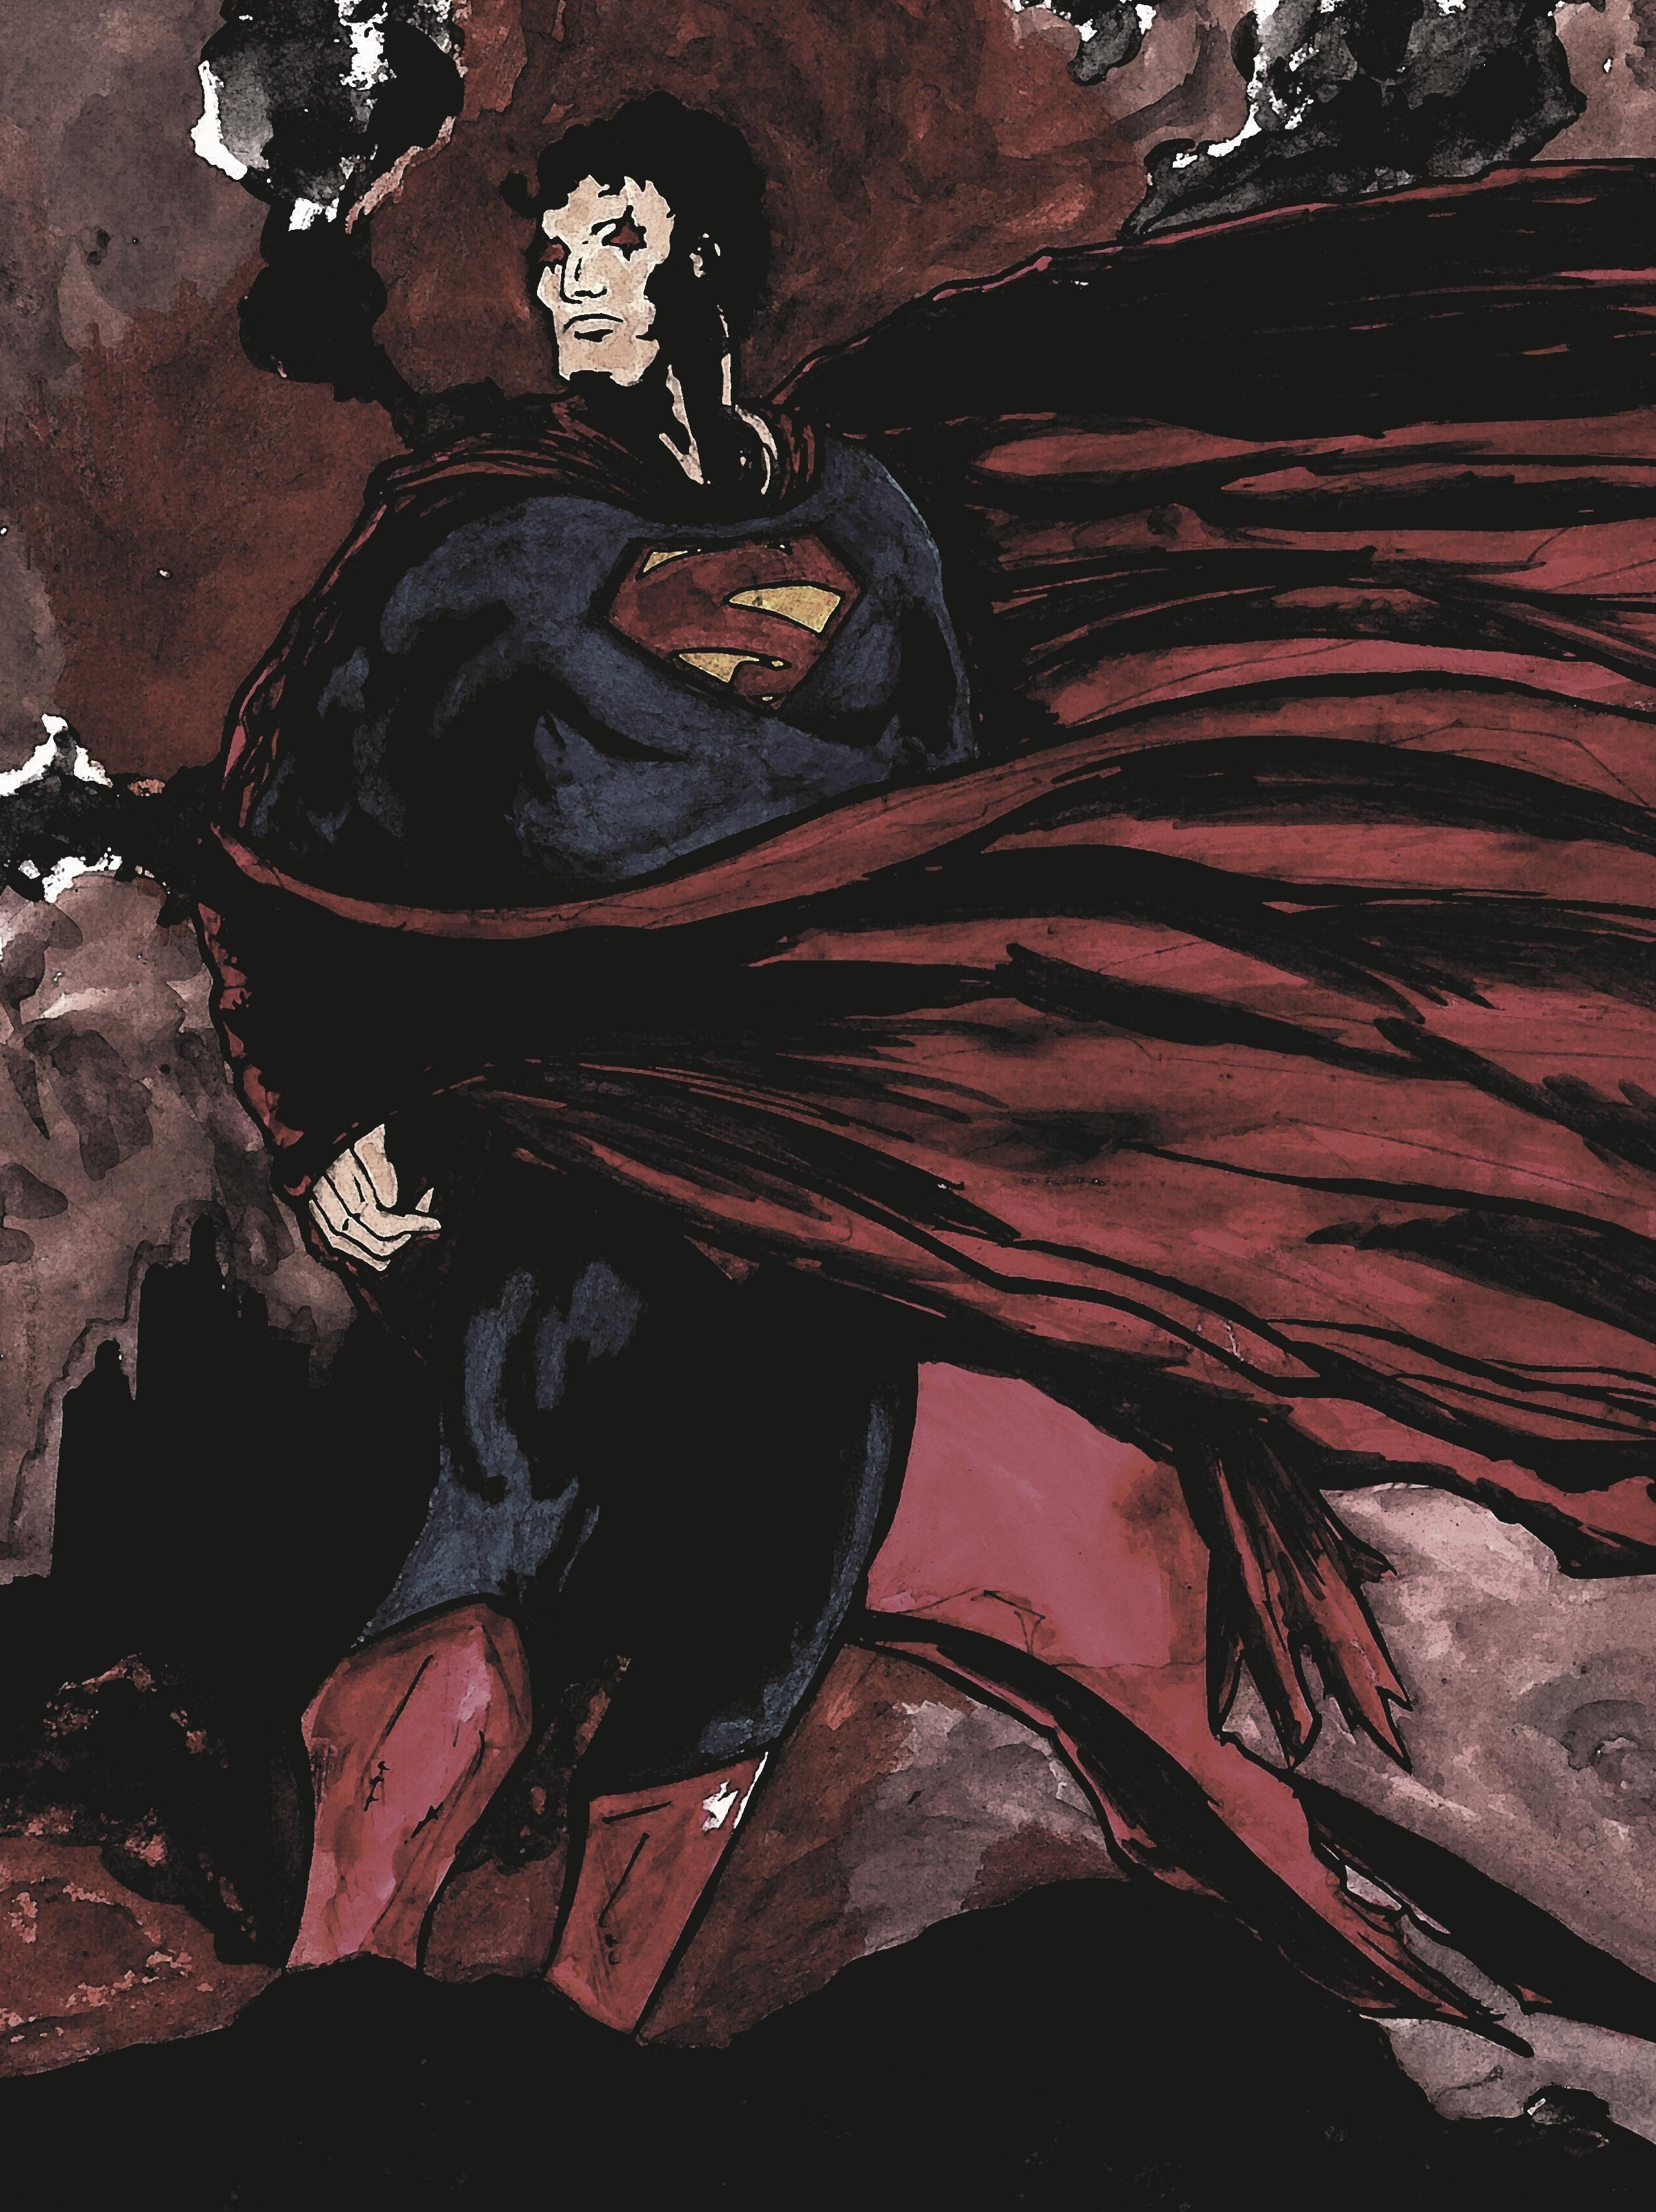 Last son of krypton acrylicindia ink water color  8 x 10 bristol